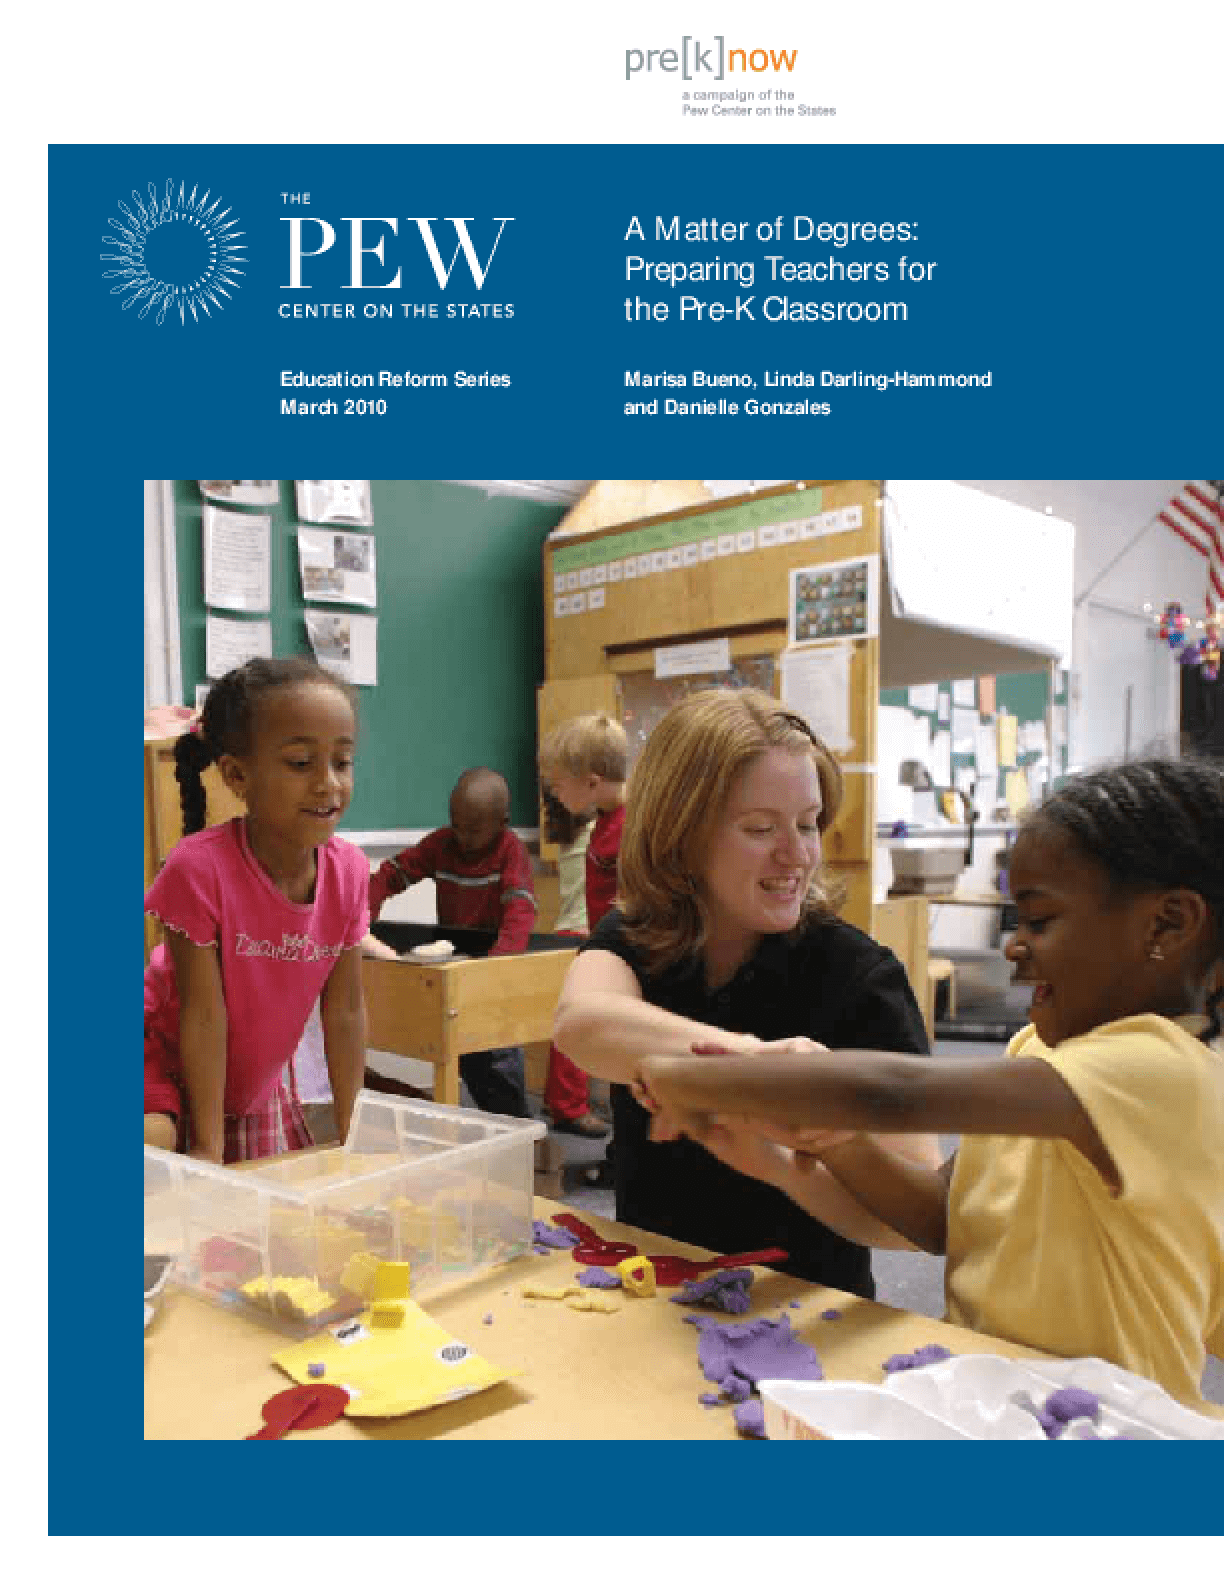 A Matter of Degrees: Preparing Teachers for the Pre-K Classroom